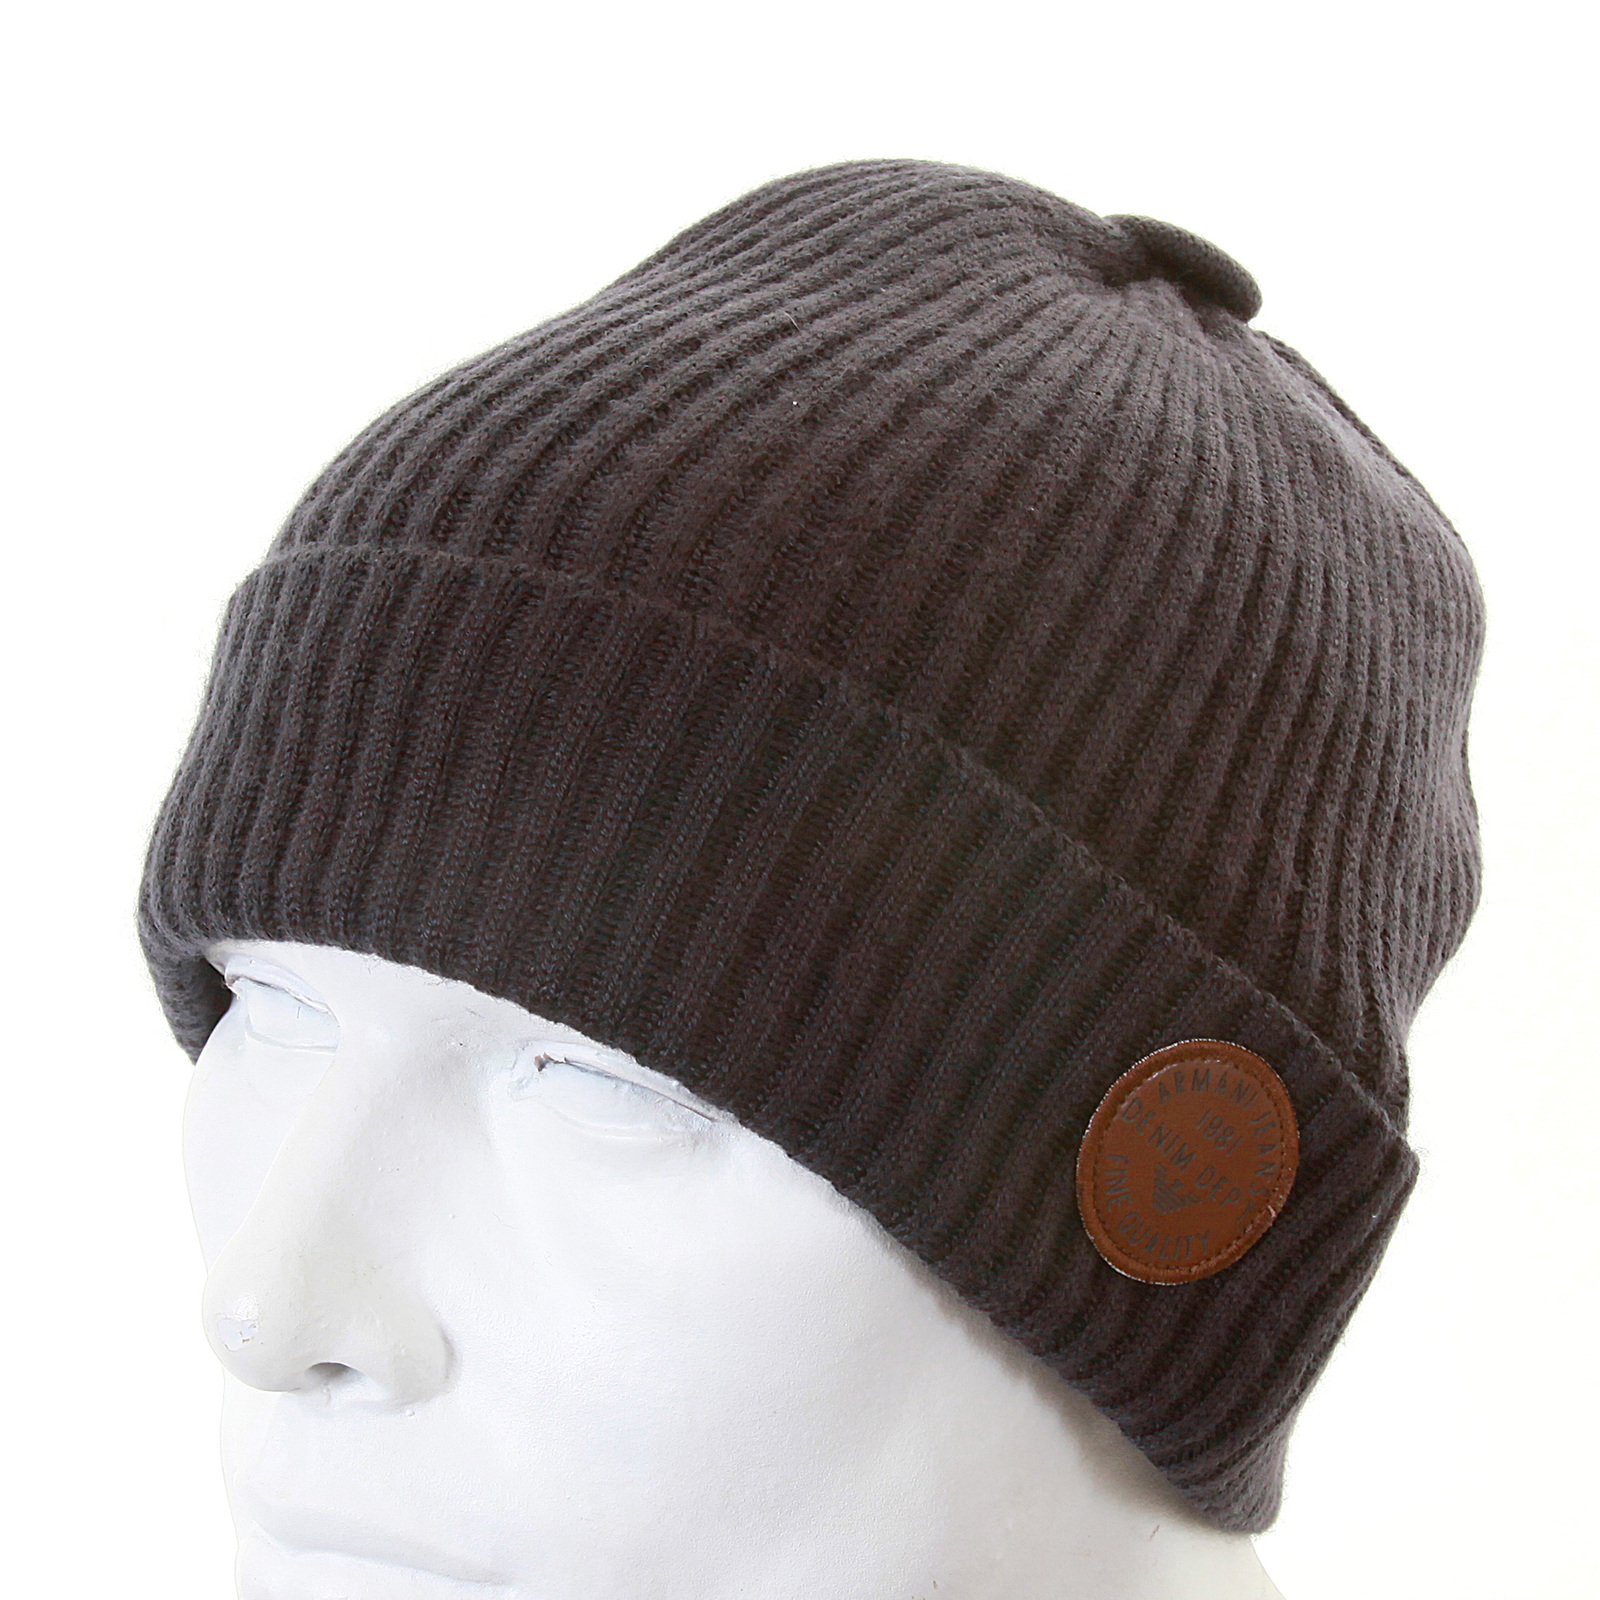 903394ac05e29c Armani Jeans dark grey rib knit beanie hat S6404 P3 AJM1342 at Togged  Clothing